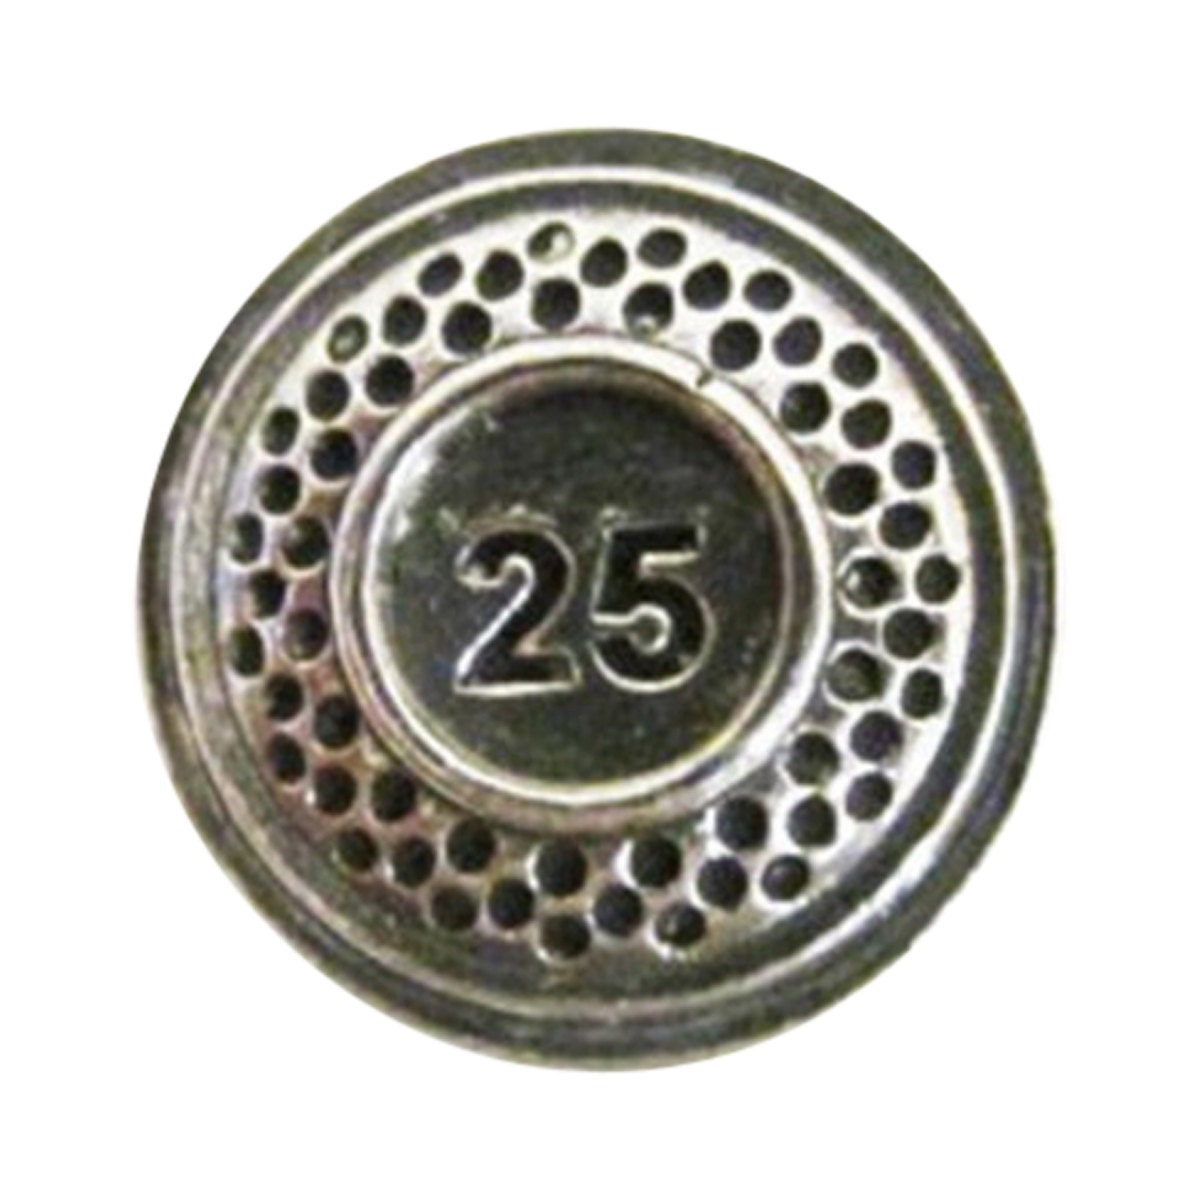 Clay Target 875 25 Refrigerator Magnet A097amac097am Etsy